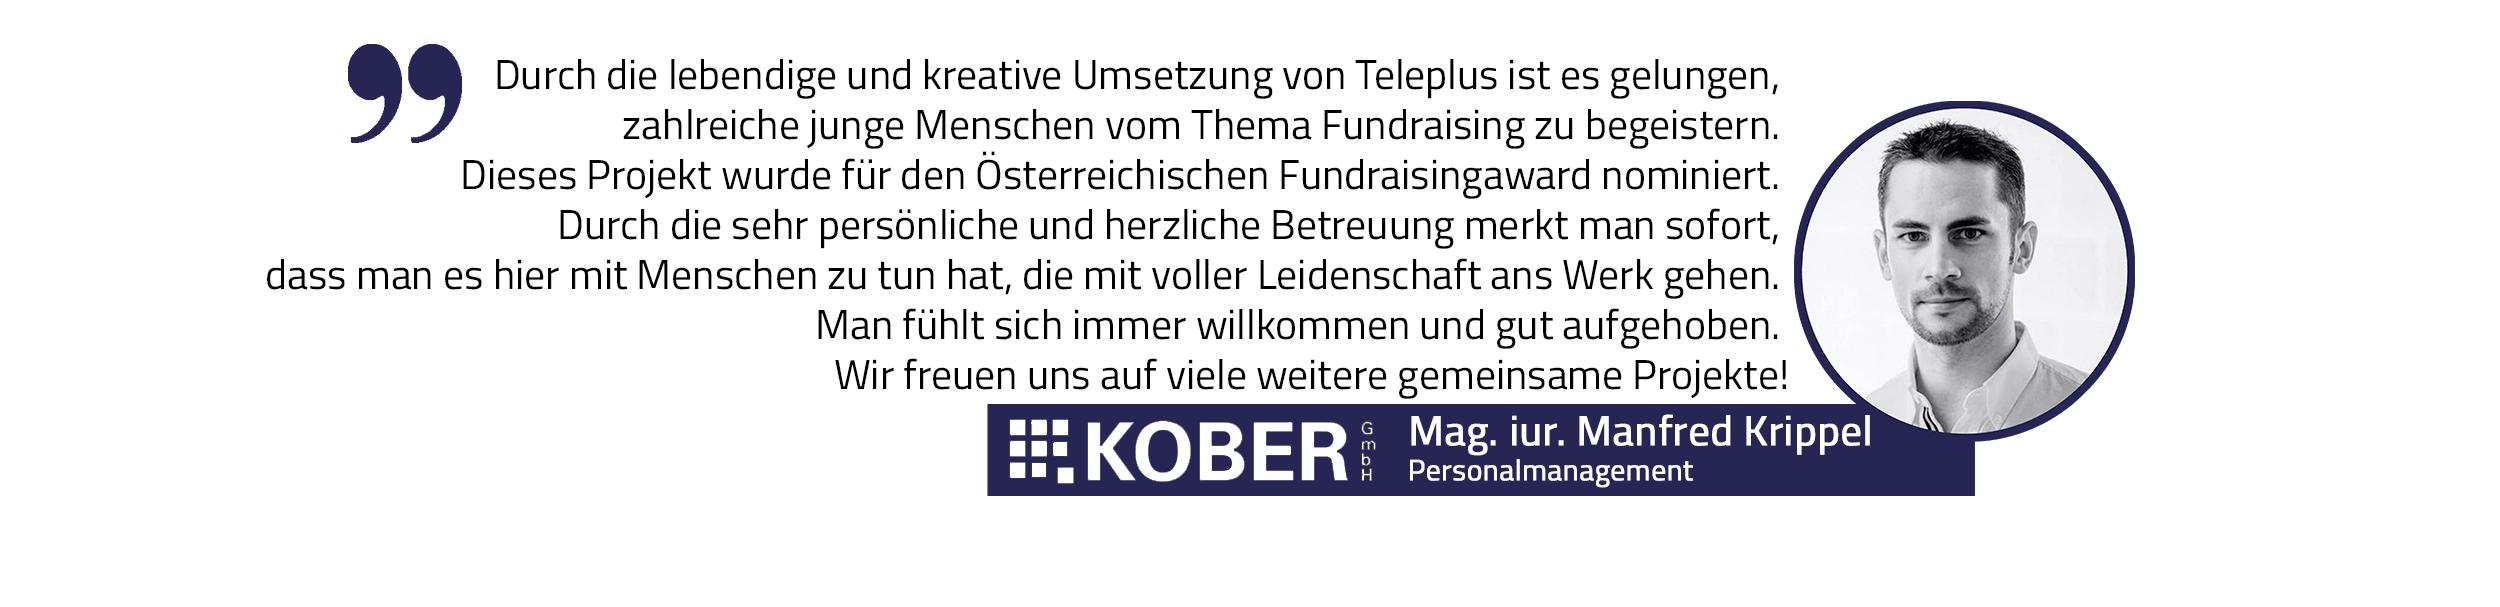 Zitate_Manfred Kripplueber Teleplus.png